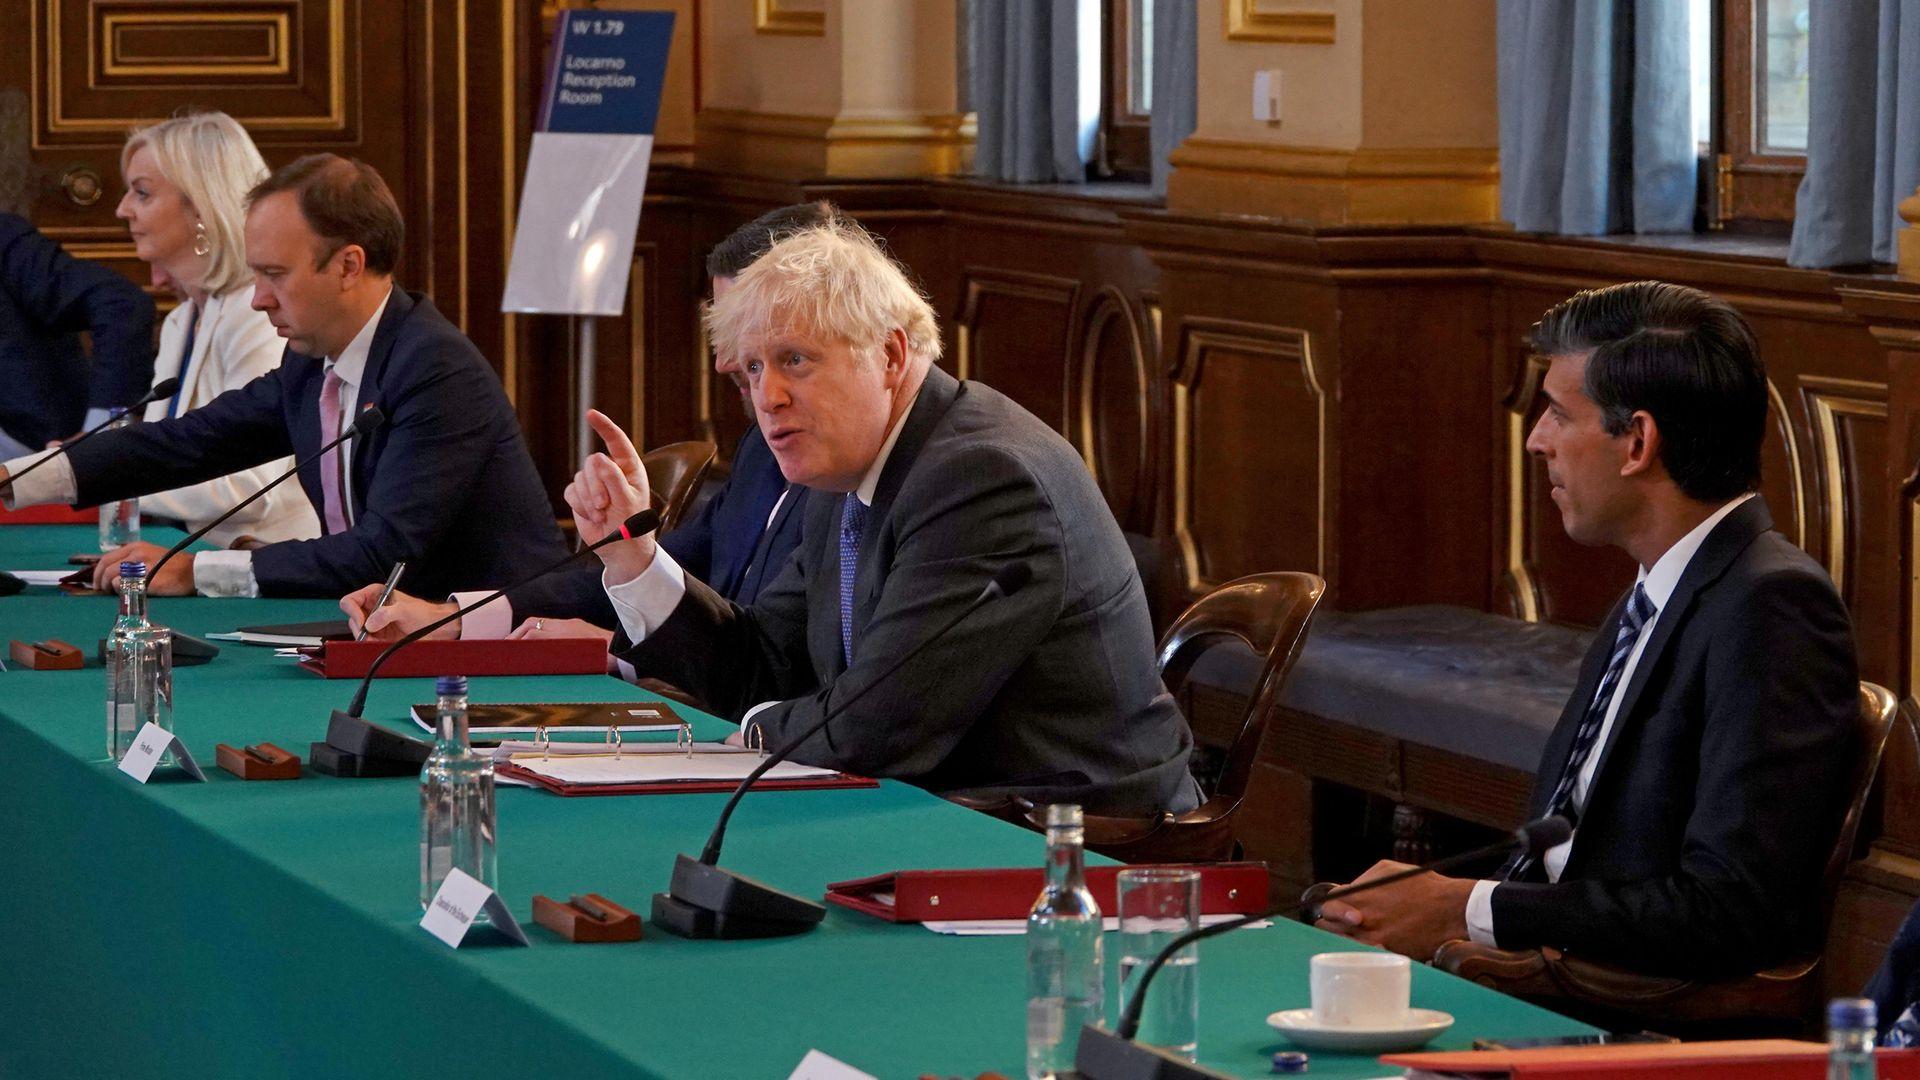 (Left to right) International Trade Secretary Liz Truss, Health Secretary Matt Hancock, Prime Minister Boris Johnson and Chancellor Rishi Sunak - Credit: PA